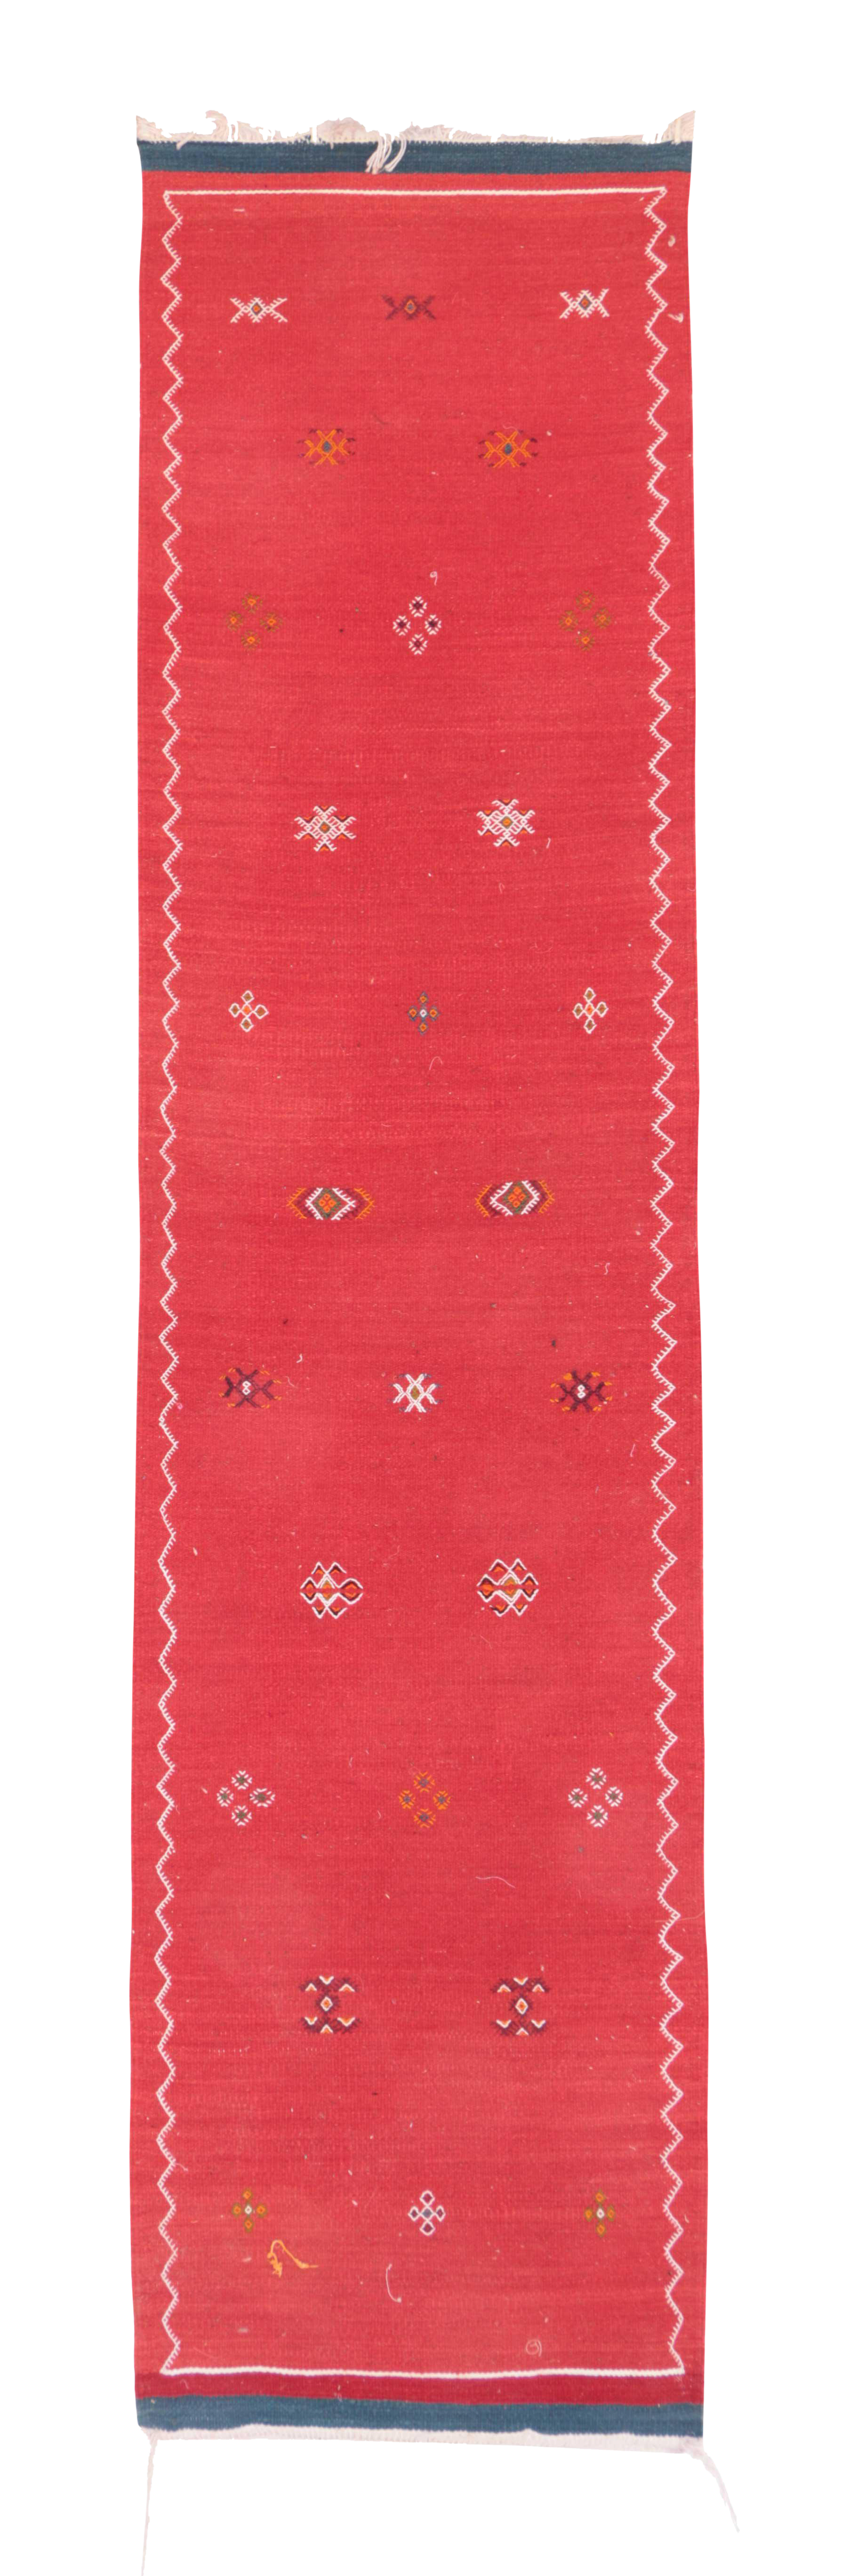 Vintage Aknif Moroccan Runner Rug - 2u0026#39;1u0026quot; x 8u0026#39;4u0026quot; : Chairish